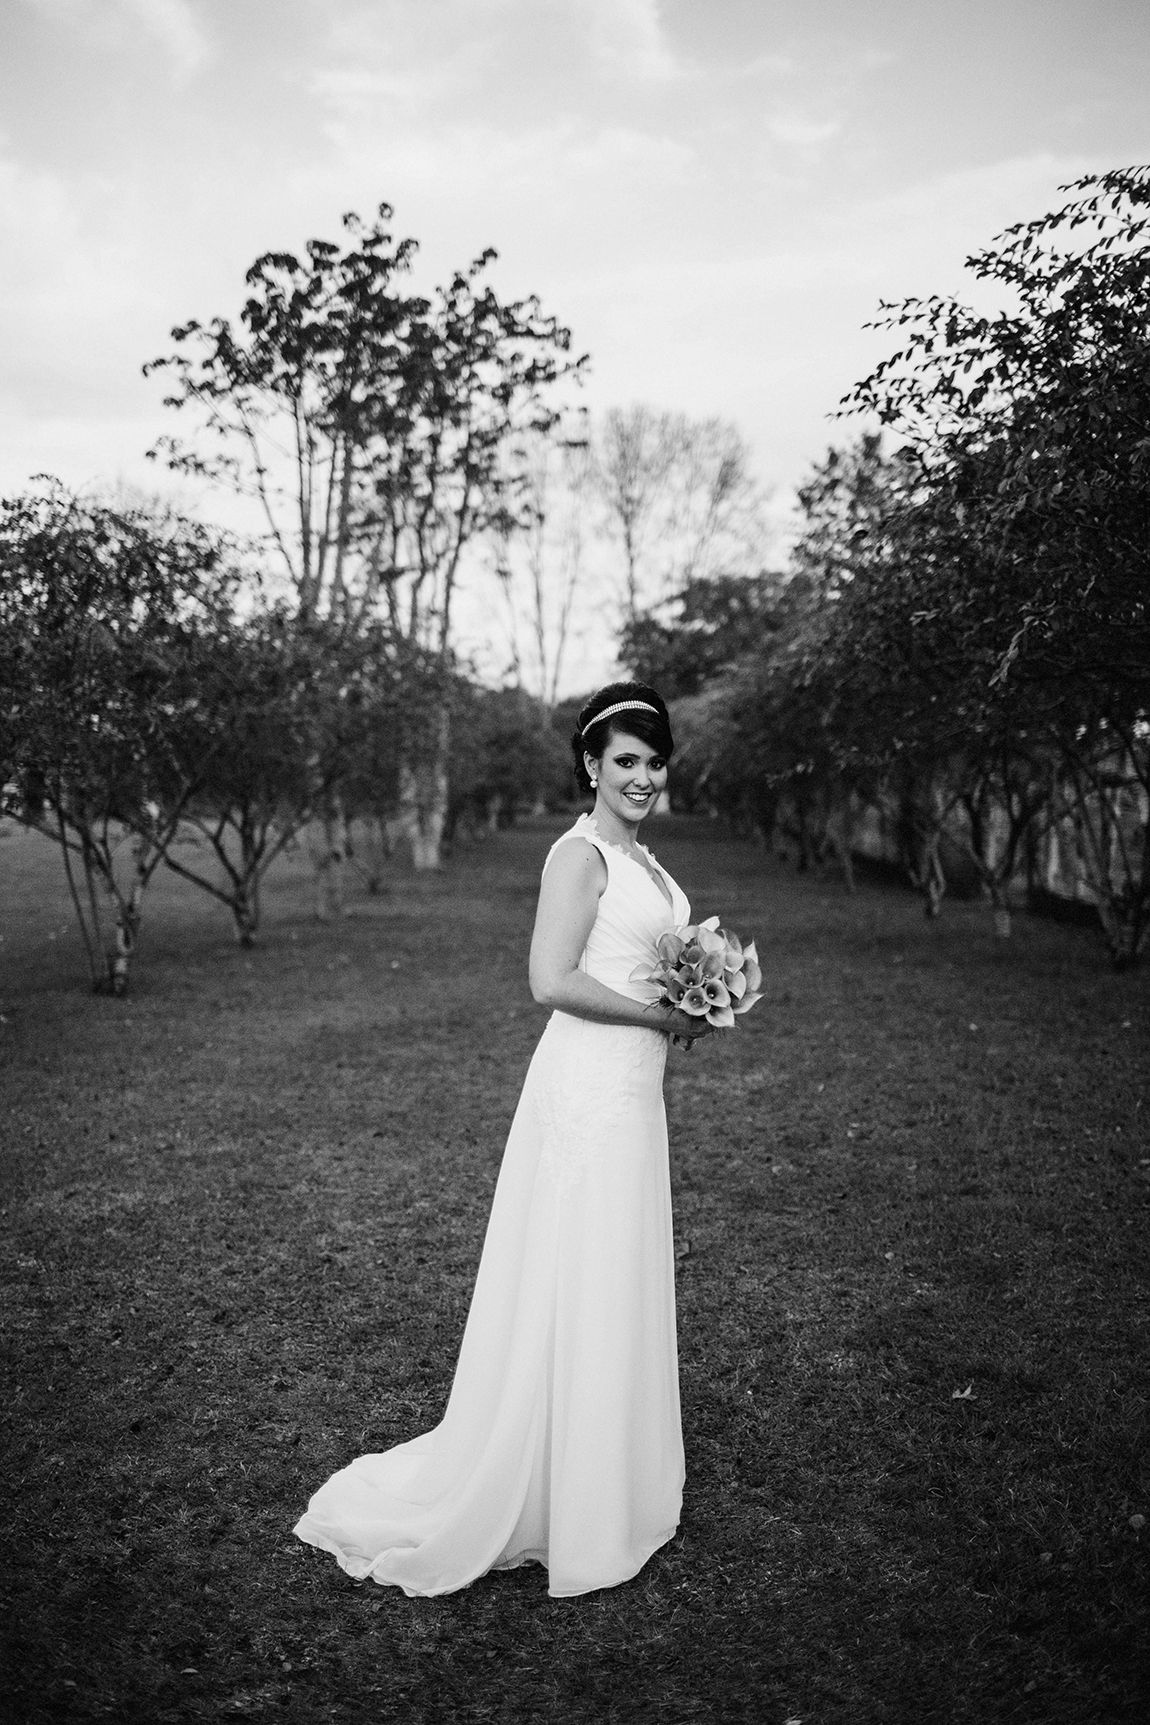 mariana-alves-fotografia-casamento-curitiba-willian-tais (253)